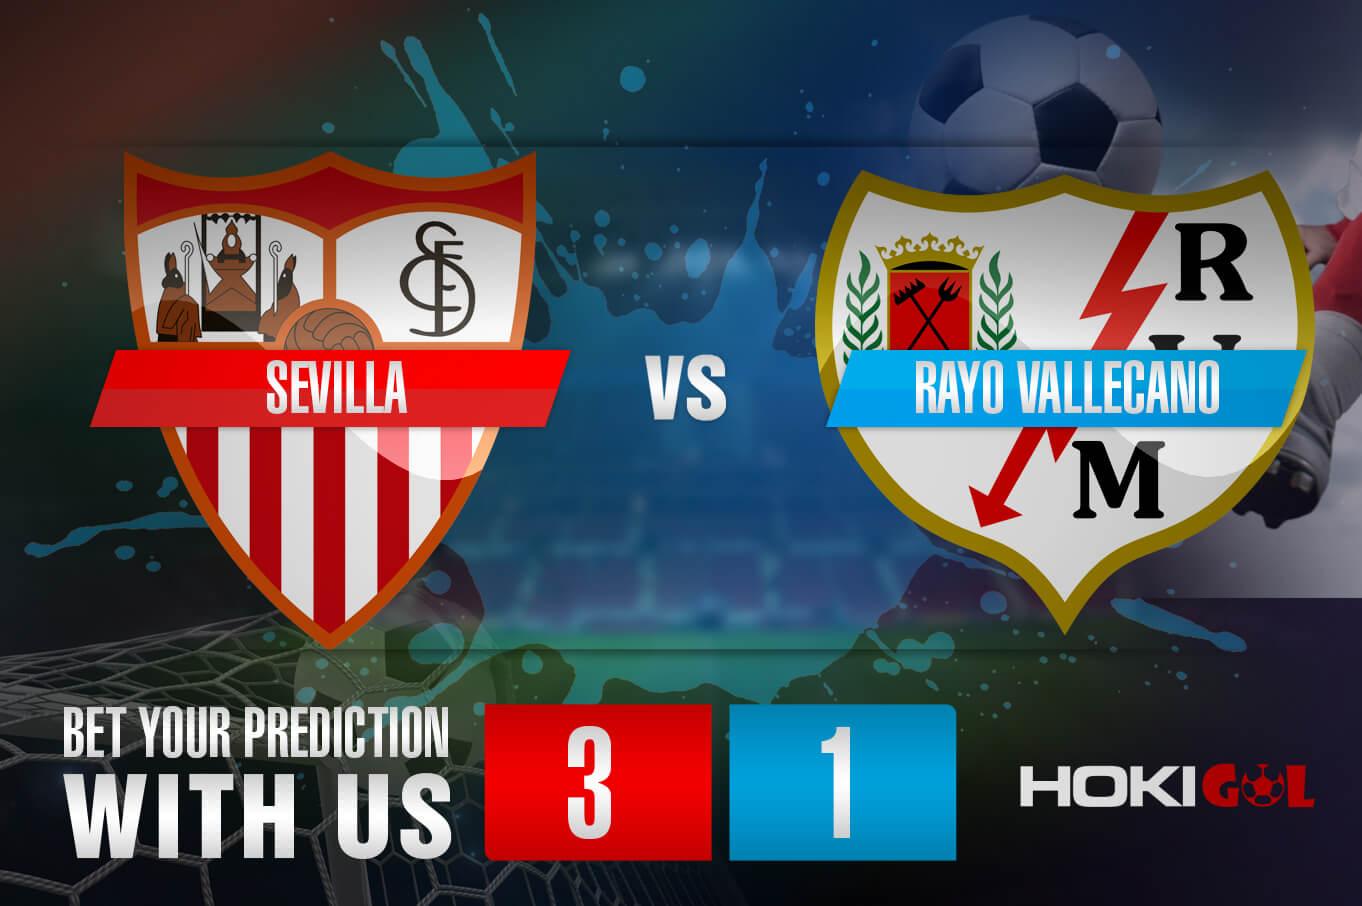 Prediksi Bola Sevilla Vs Rayo Vallecano 16 Agustus 2021